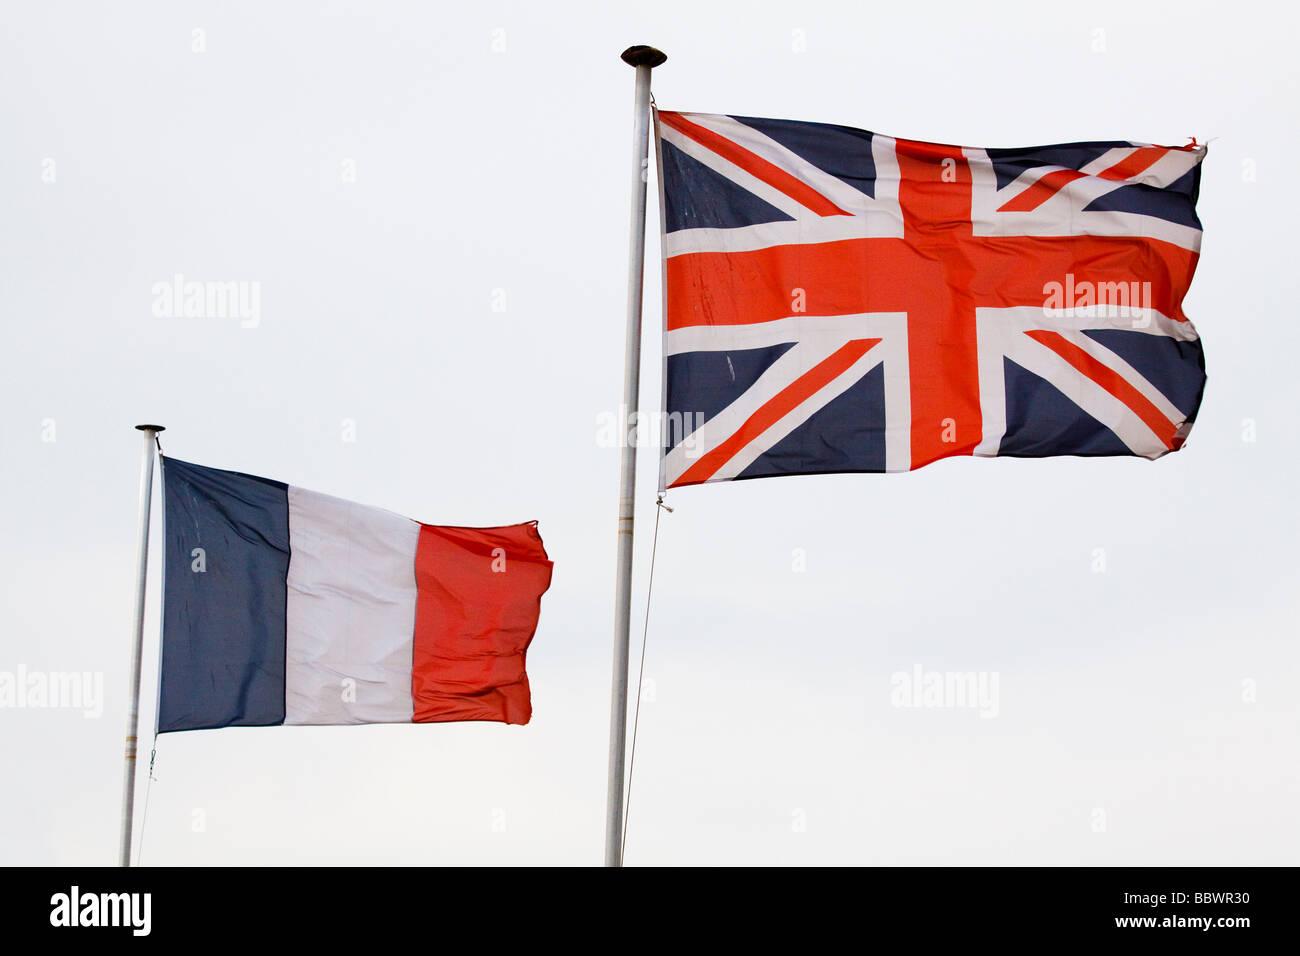 union jack and drapeau tricolore Stock Photo